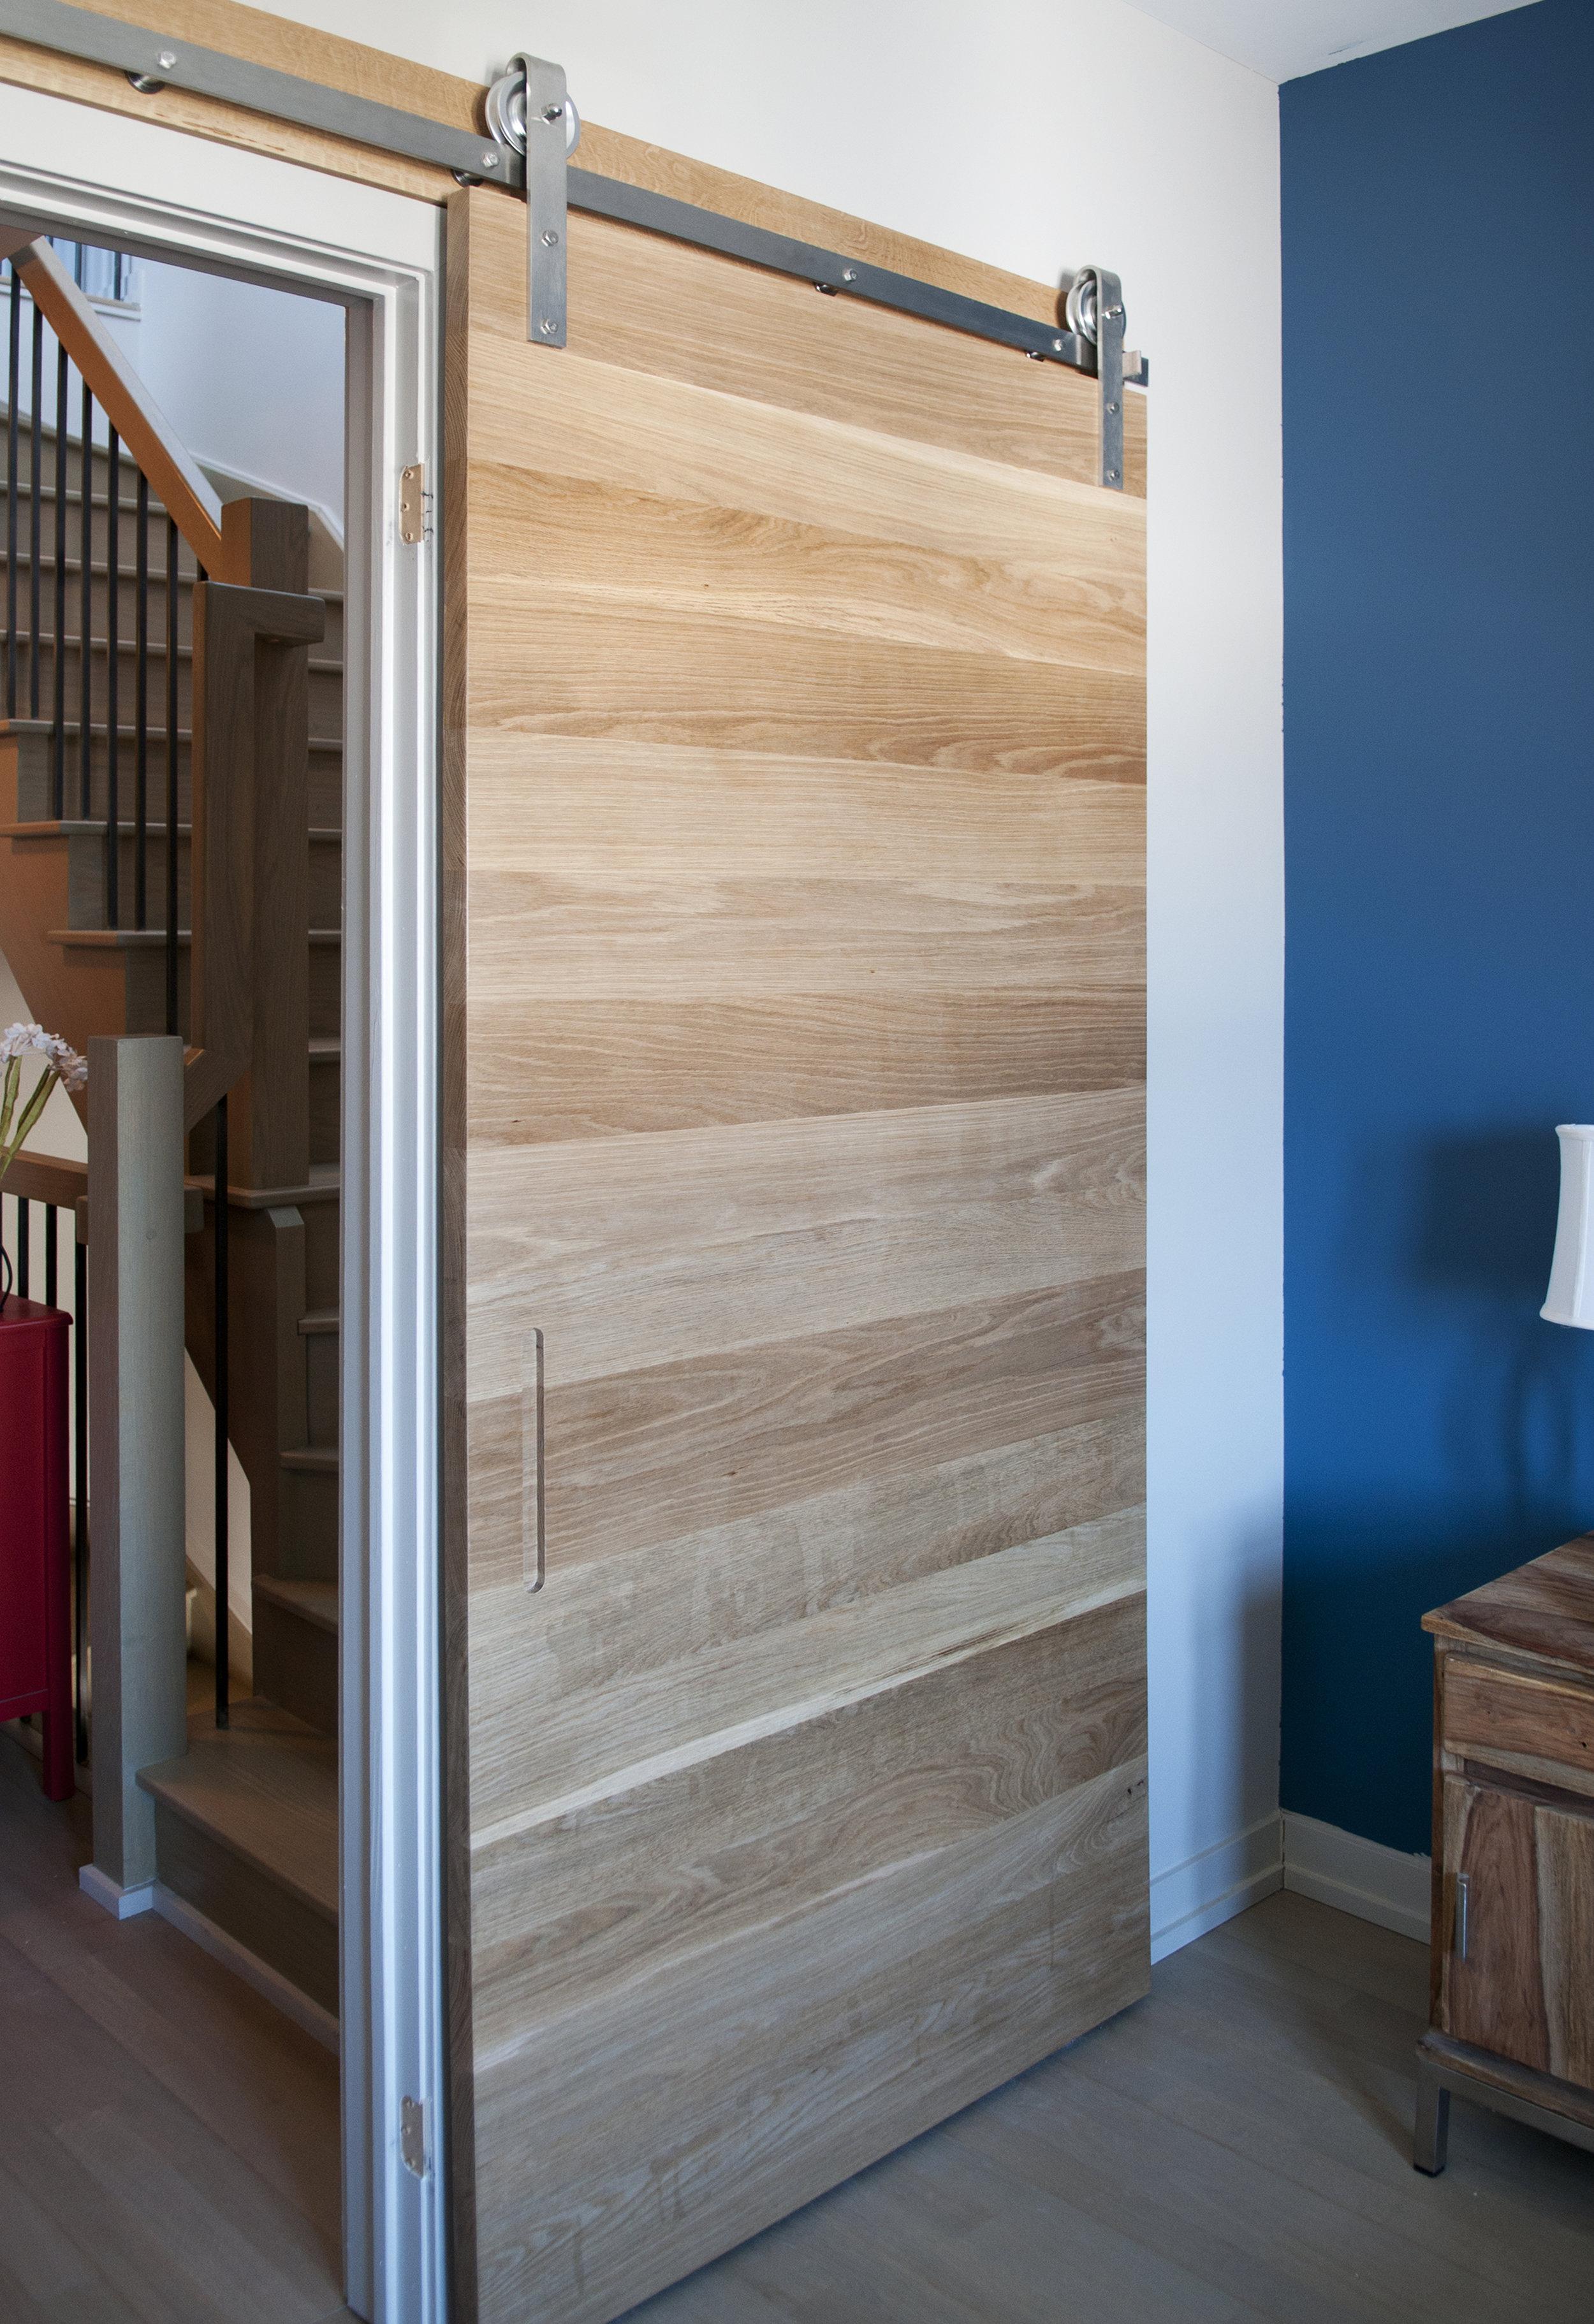 Solid white oak horizontal planks